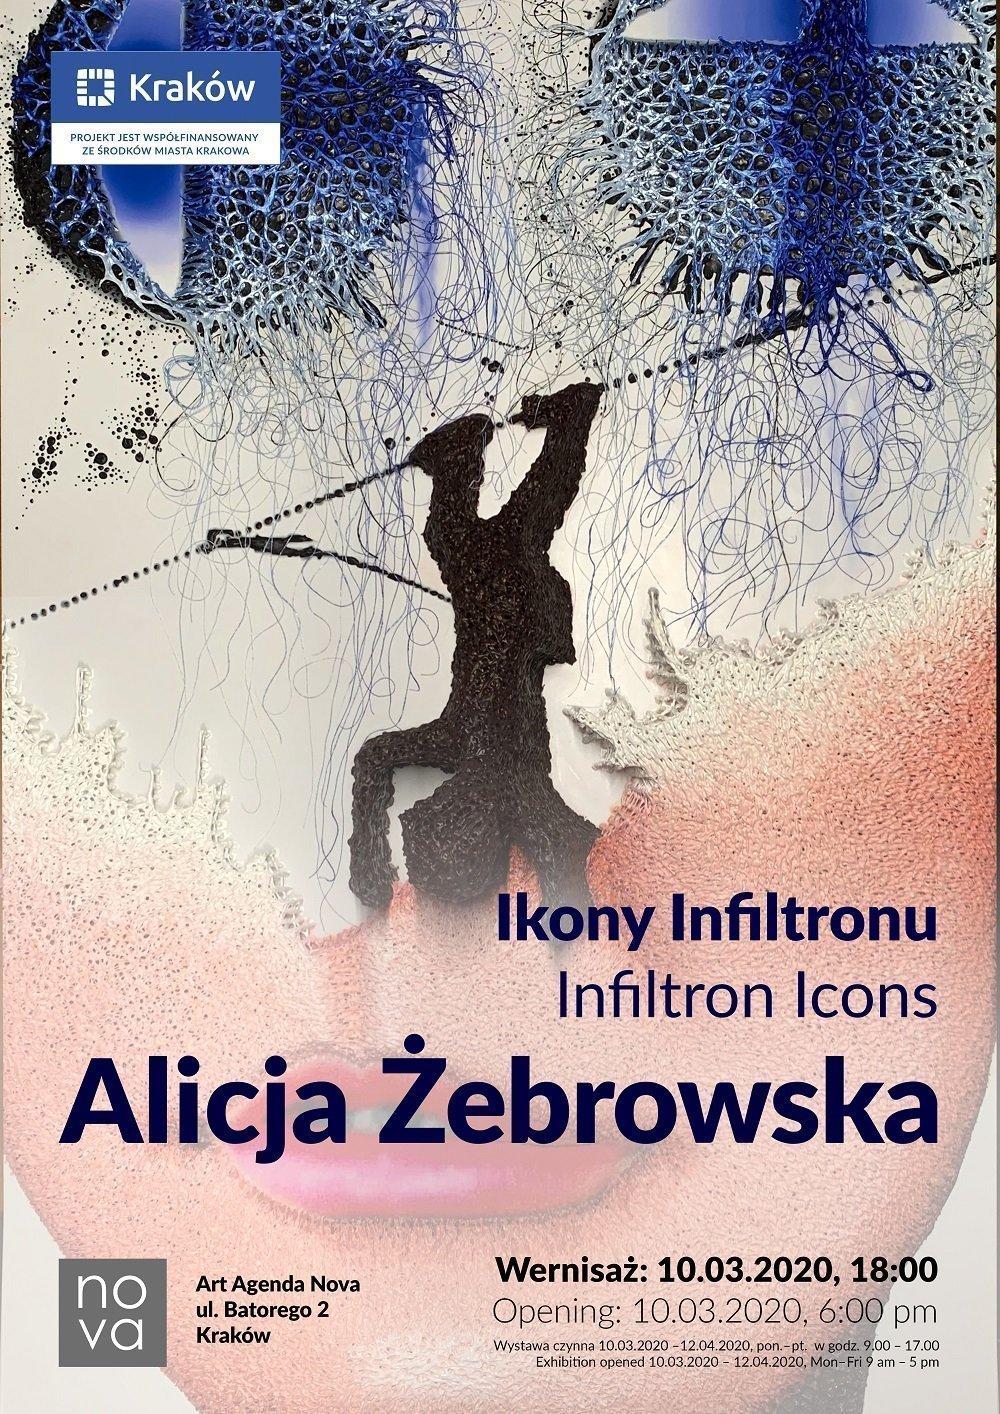 Alicja Żebrowska